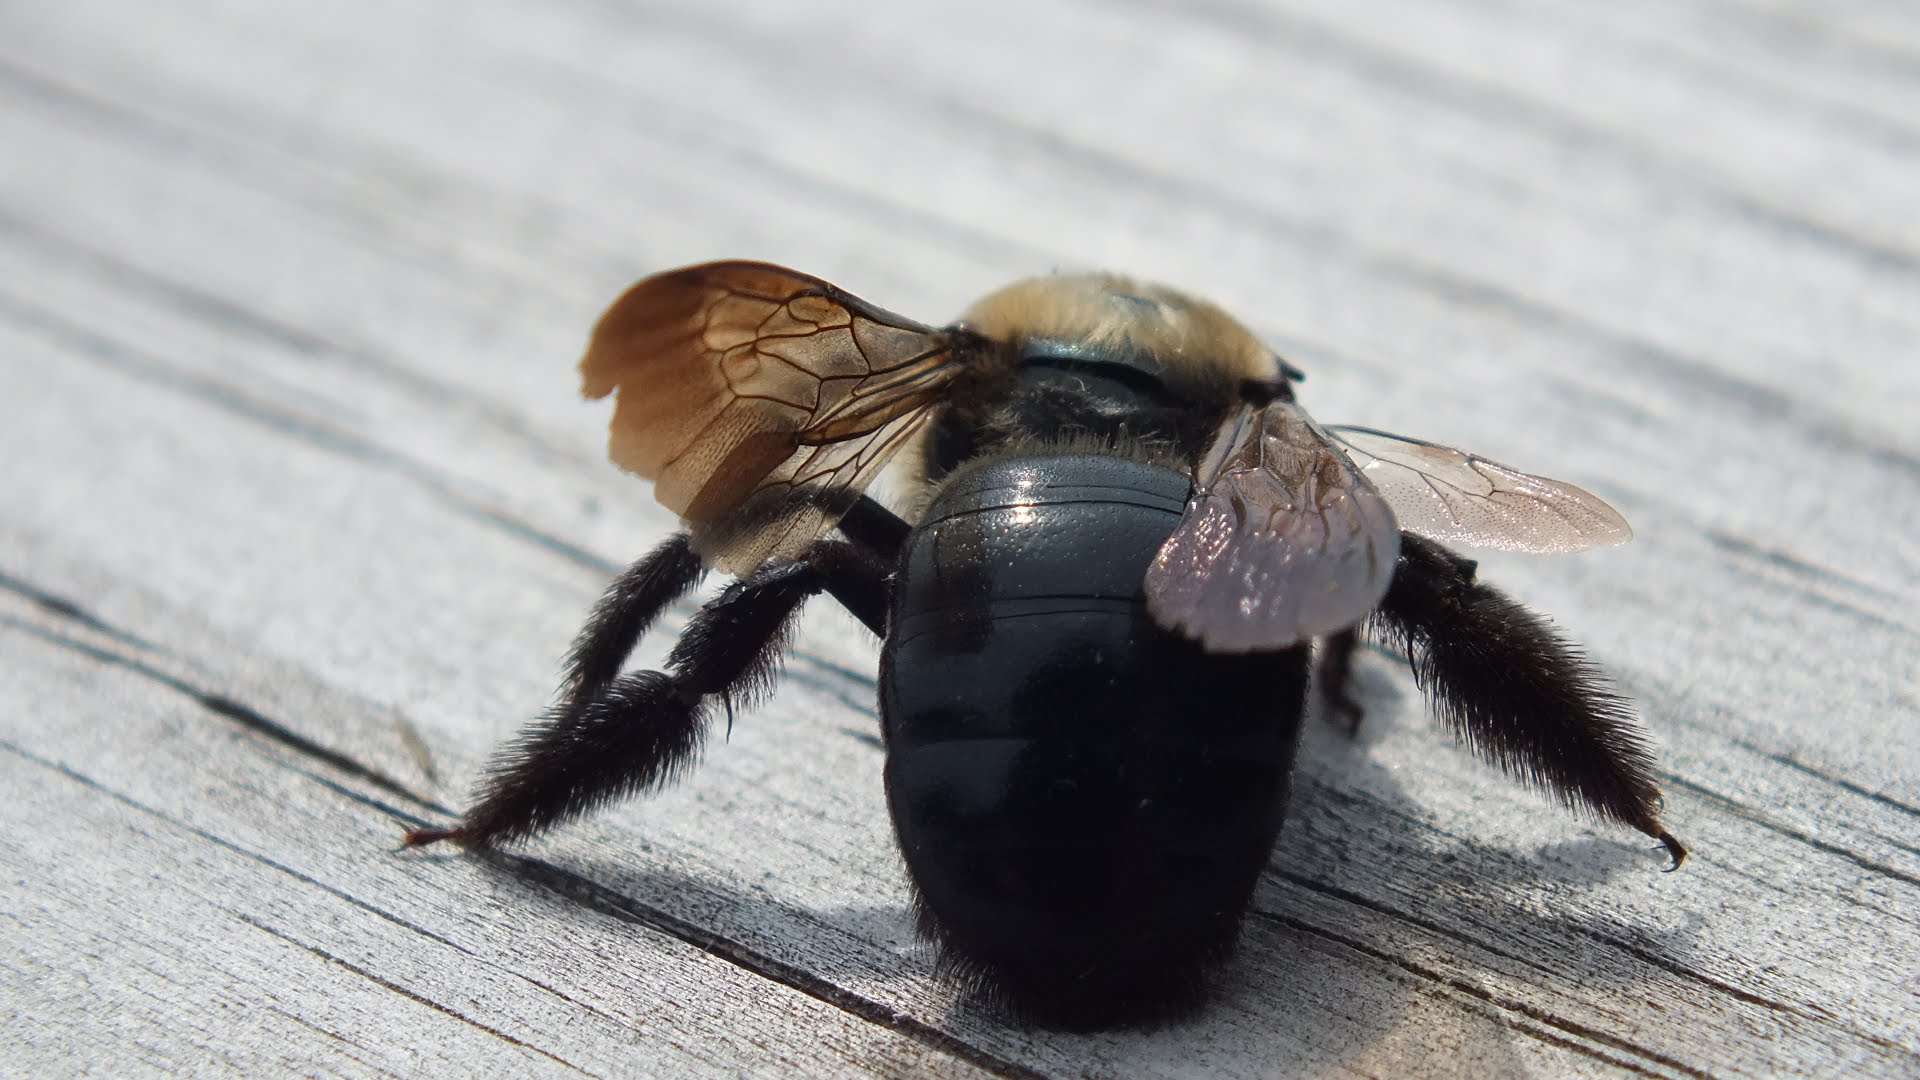 Carpenter bees - photo#45